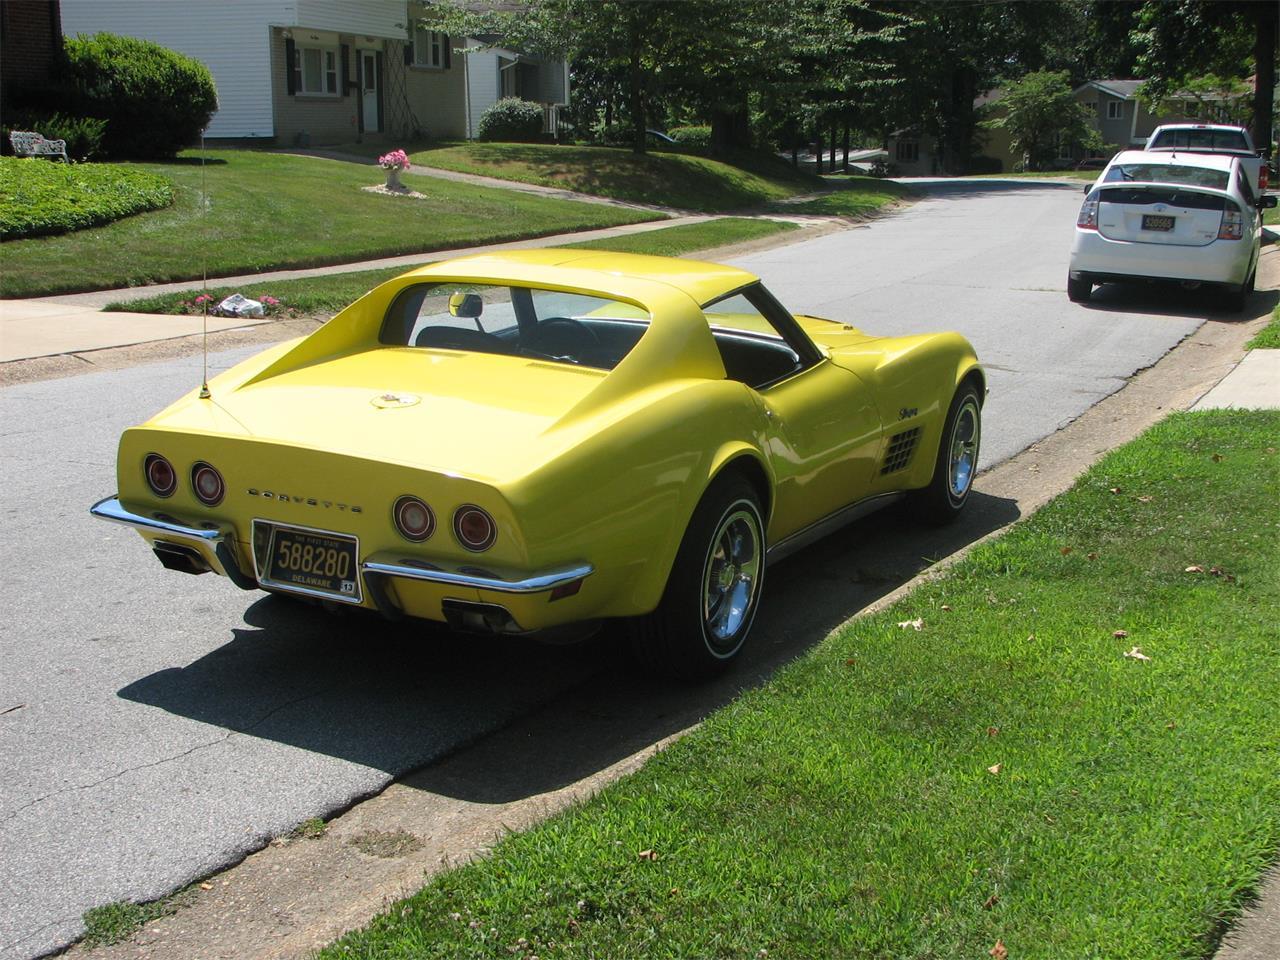 1970 Chevrolet Corvette (CC-1193248) for sale in Claymont, Delaware